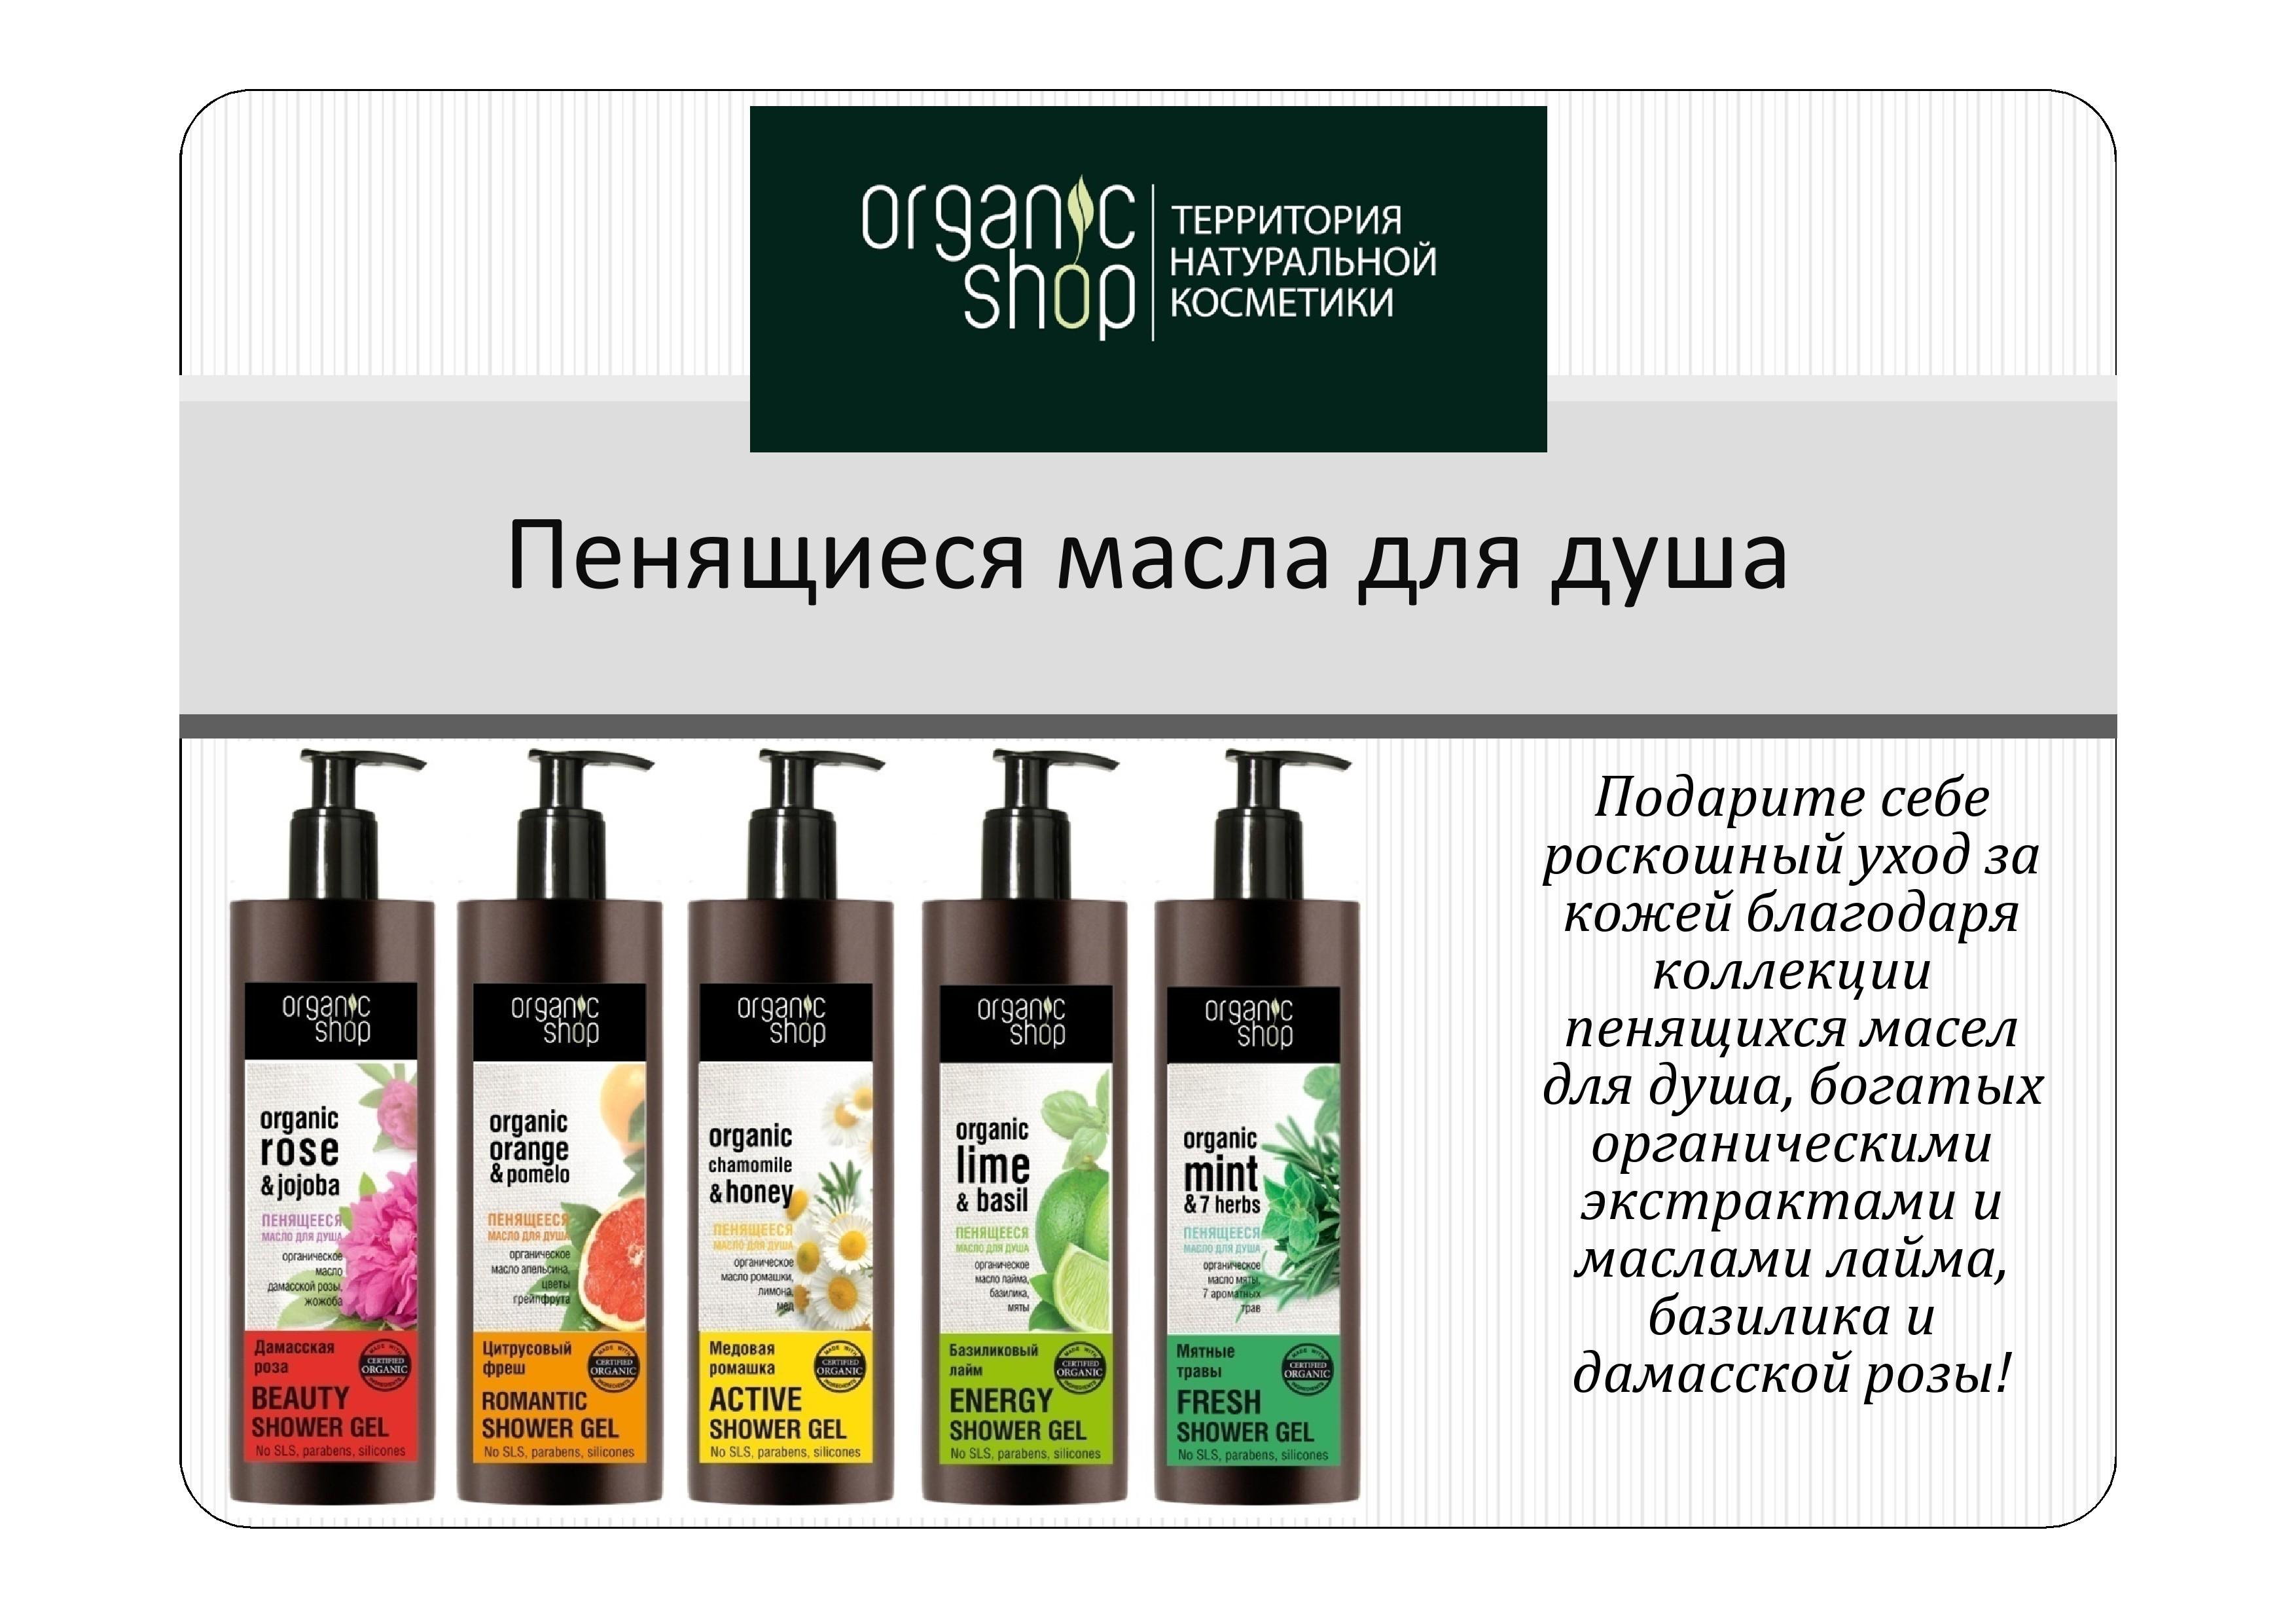 Allwantsimg.com / organic shop официальный сайт.